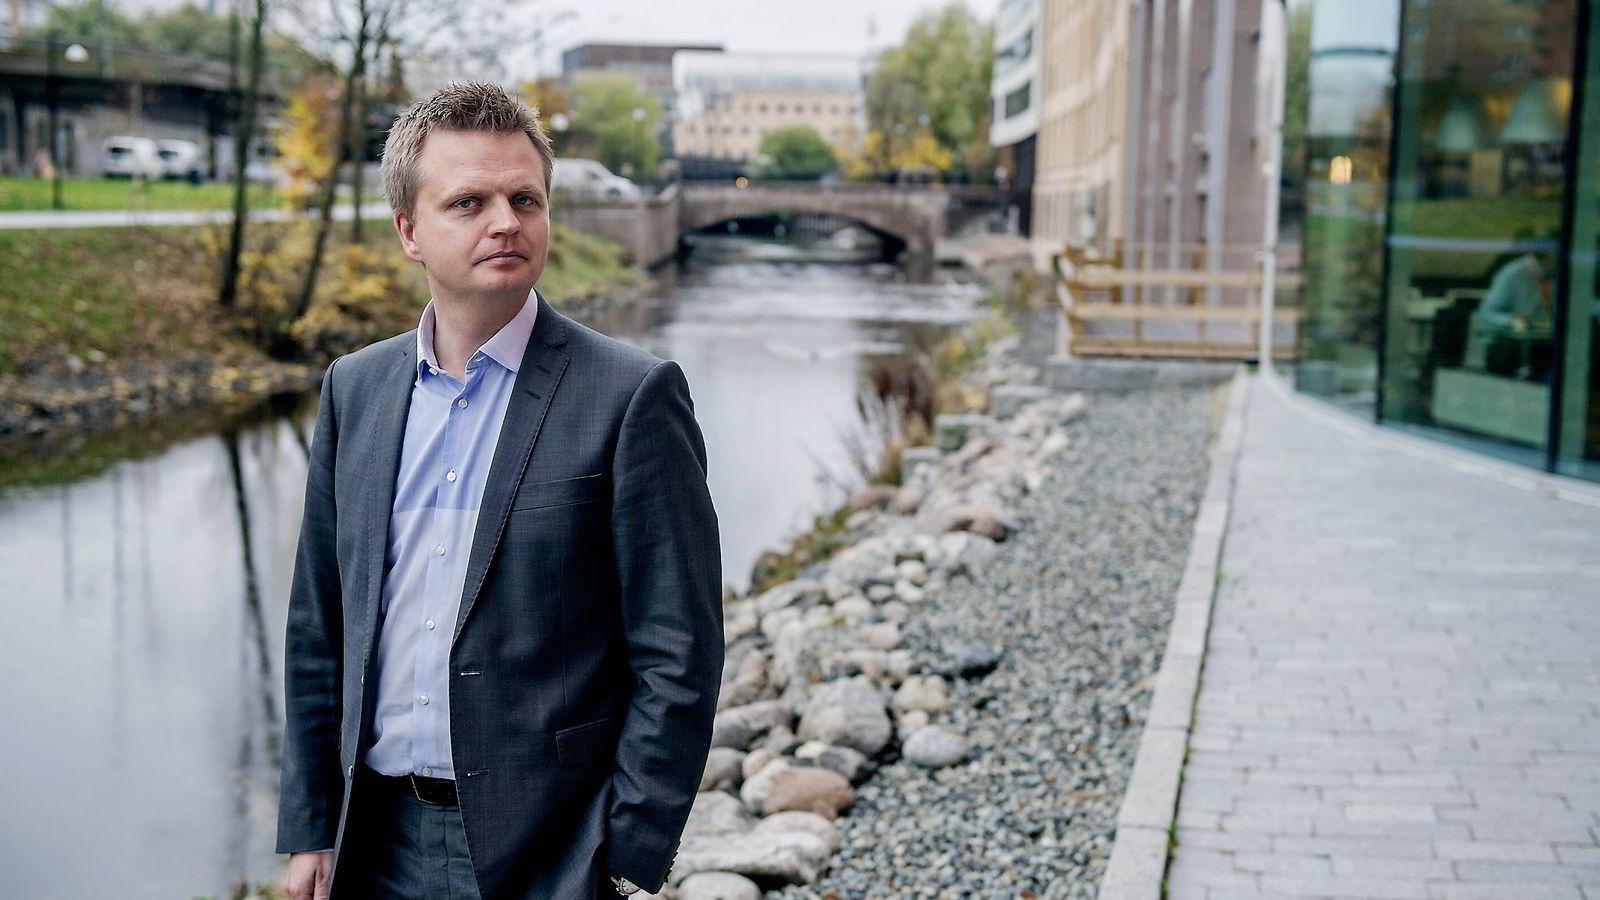 Seniorforsker Vegard Kolbjørnsrud tror roboter kan bistå ledere som assistenter og analytikere, men at de i fremtiden også vil ta beslutninger.